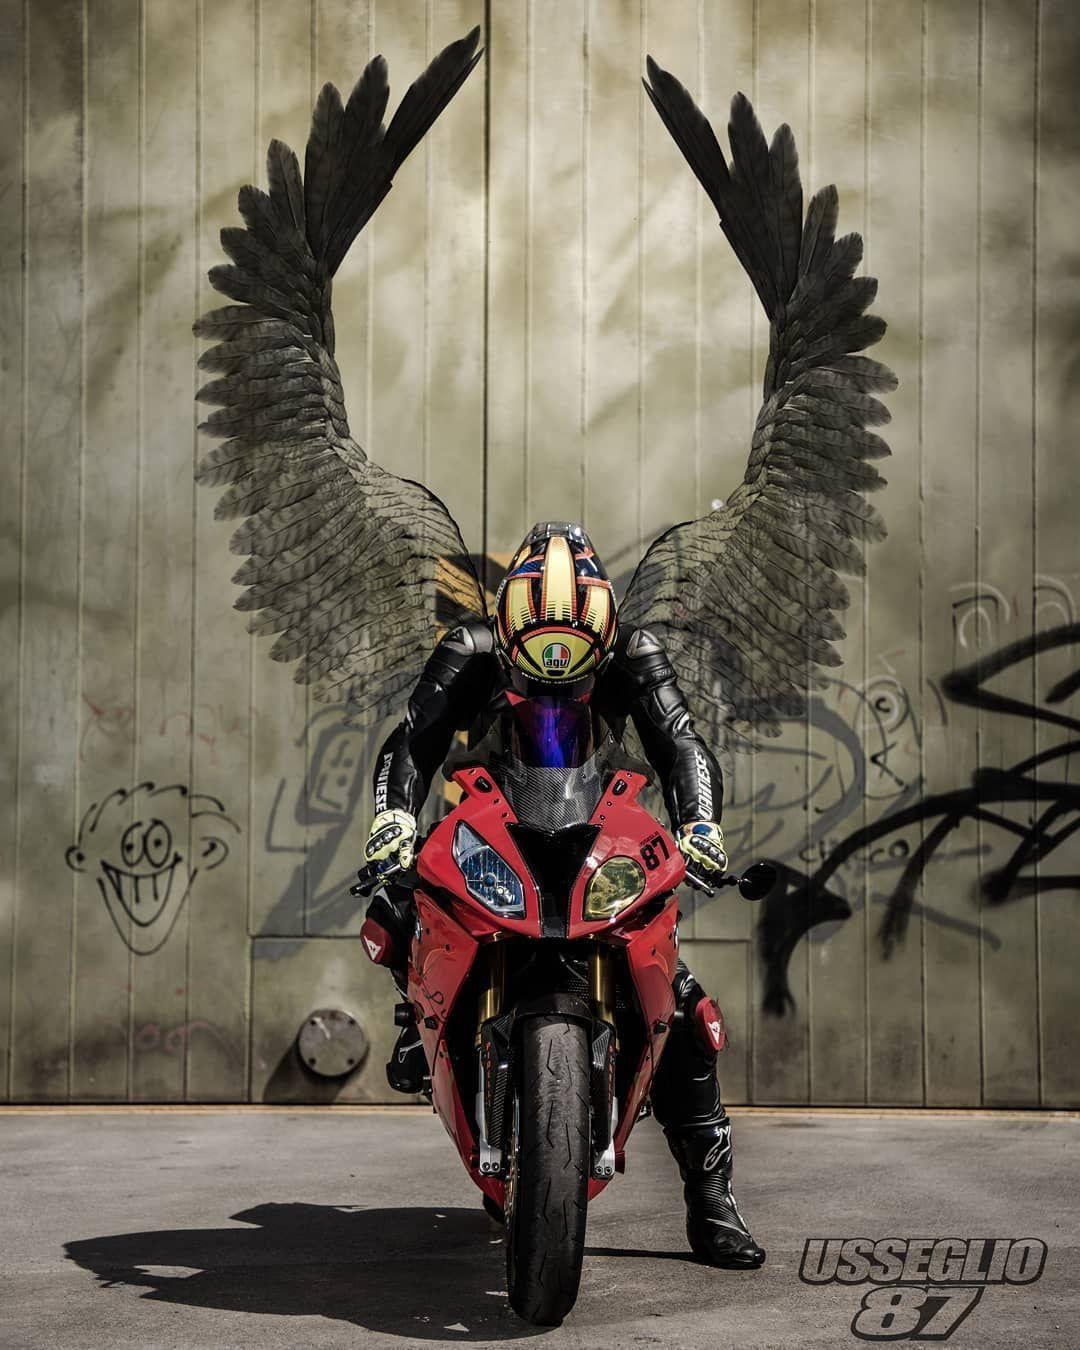 Iyi Geceler Rider Usseglio87 Bmw S1000rr Ikinci El Ekipman